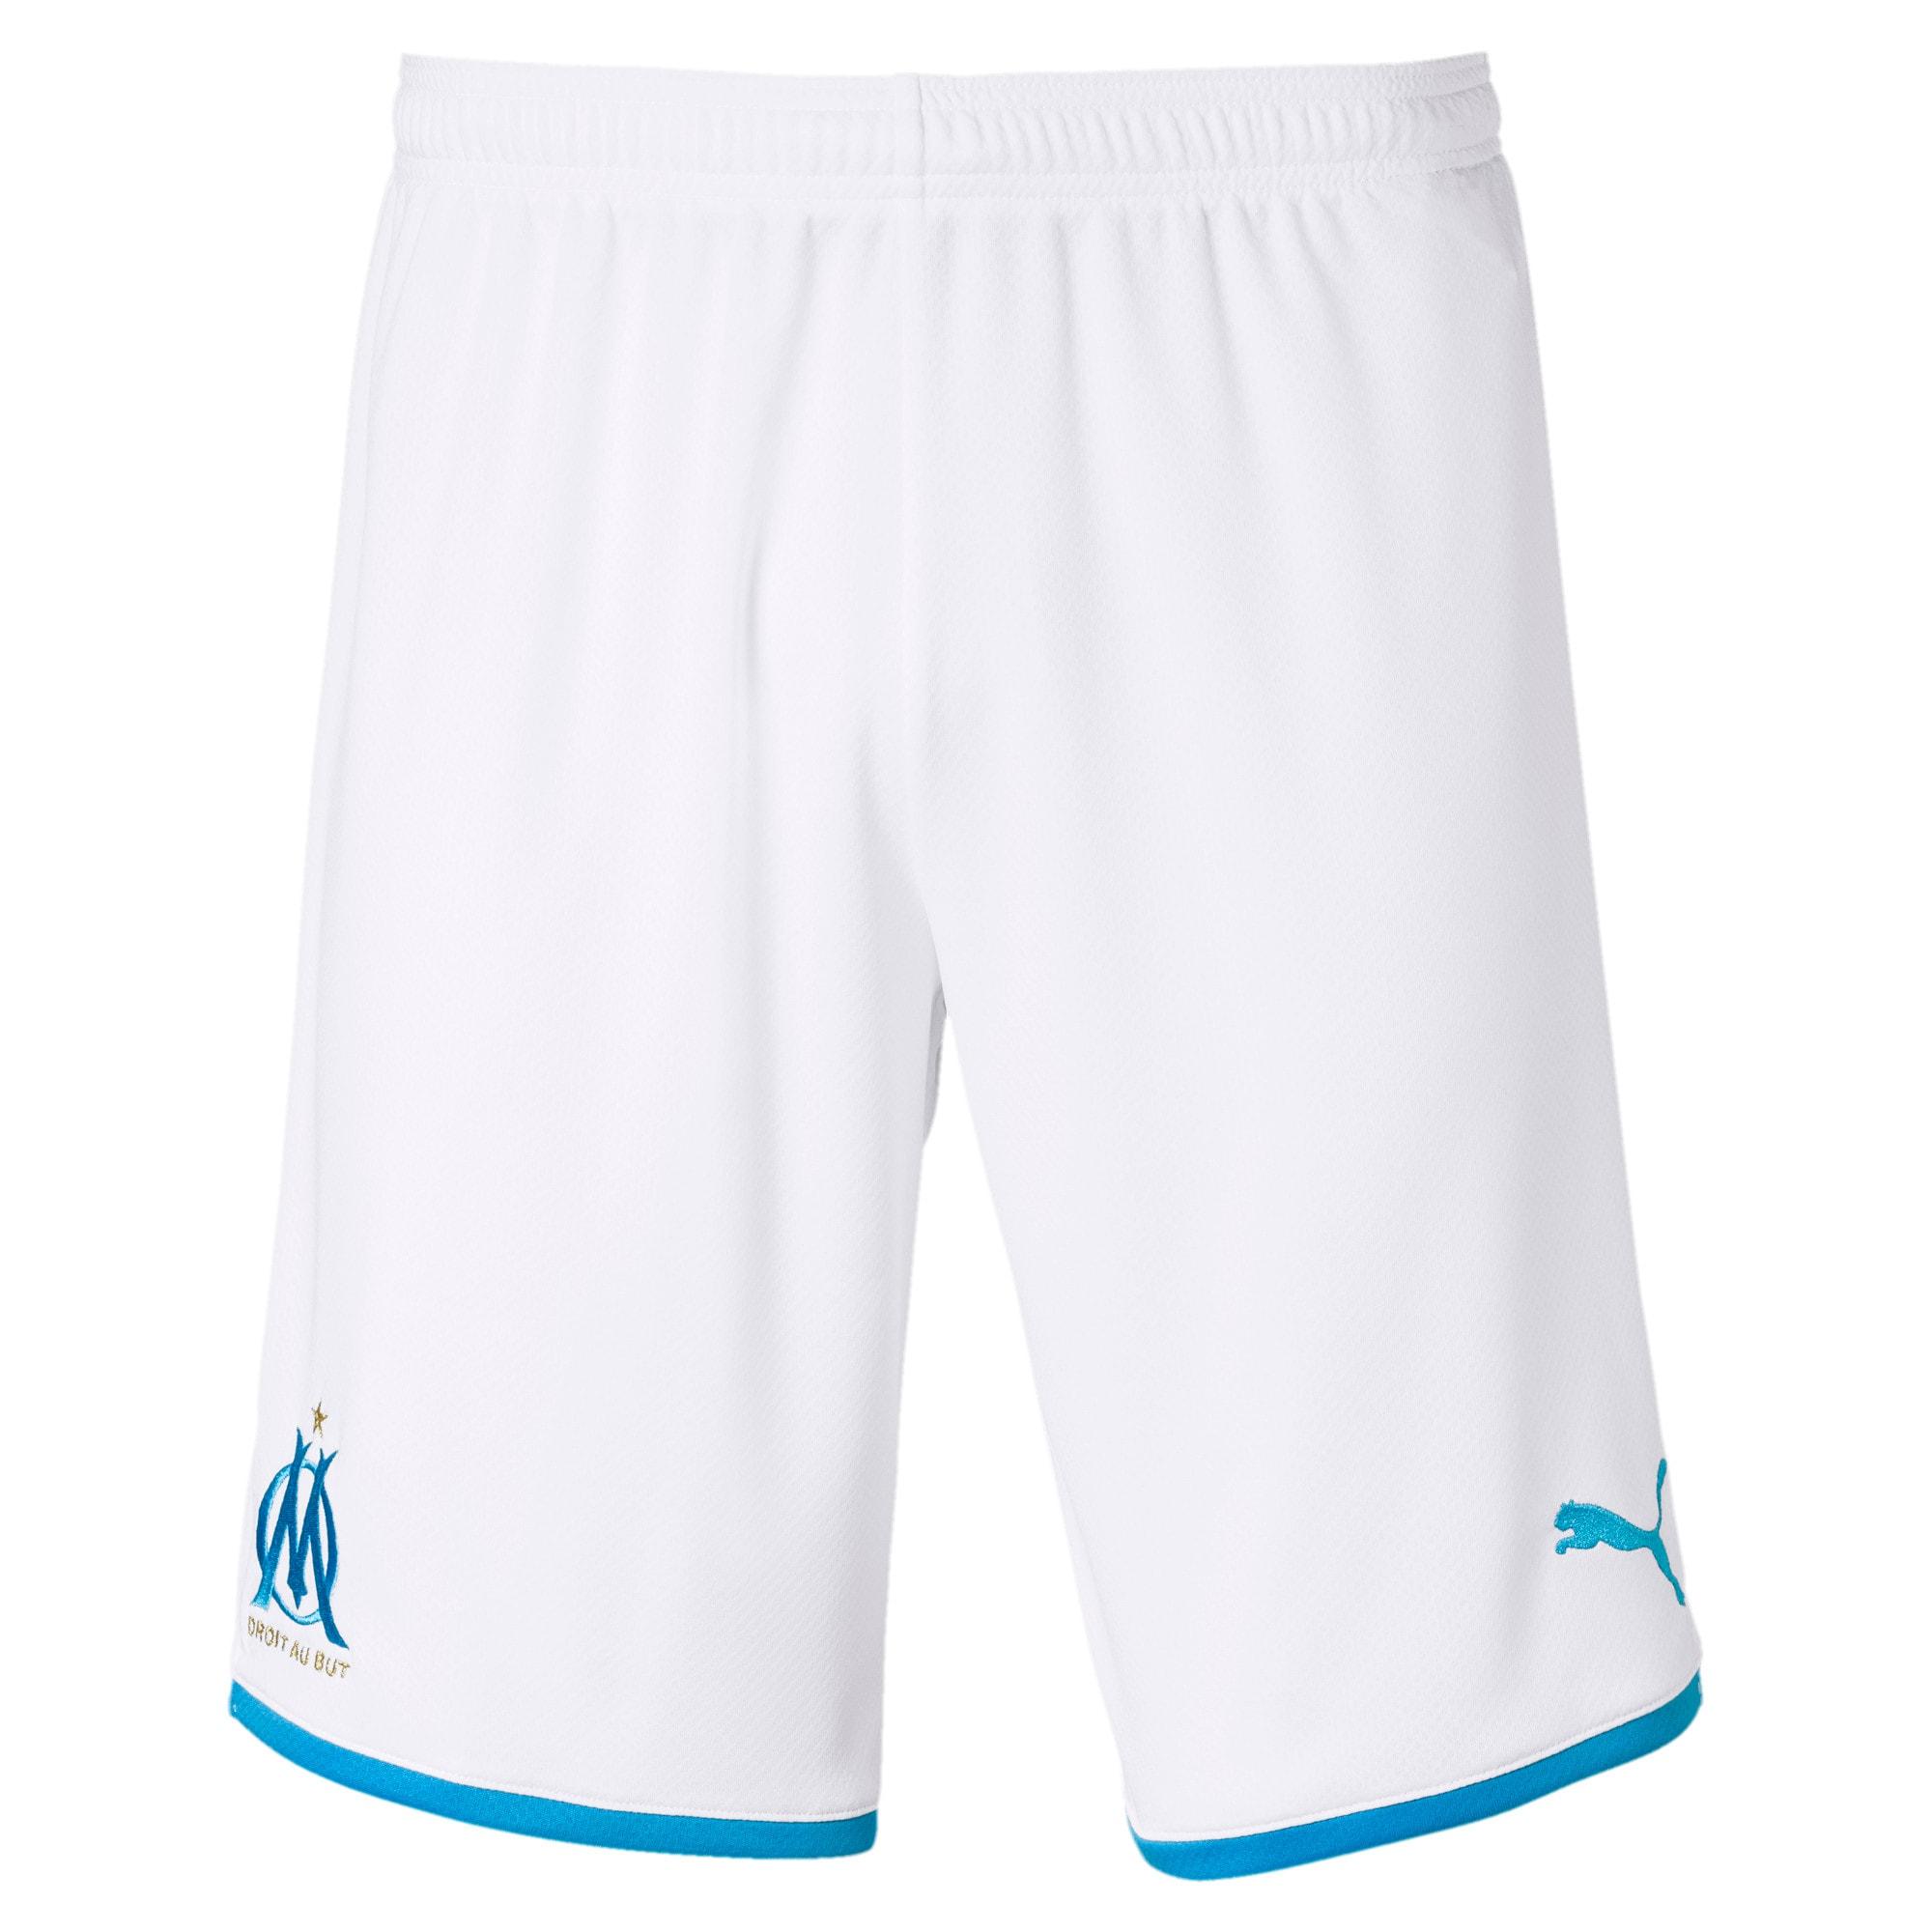 Thumbnail 1 of Olympique de Marseille Men's Replica Shorts, Puma White-Bleu Azur, medium